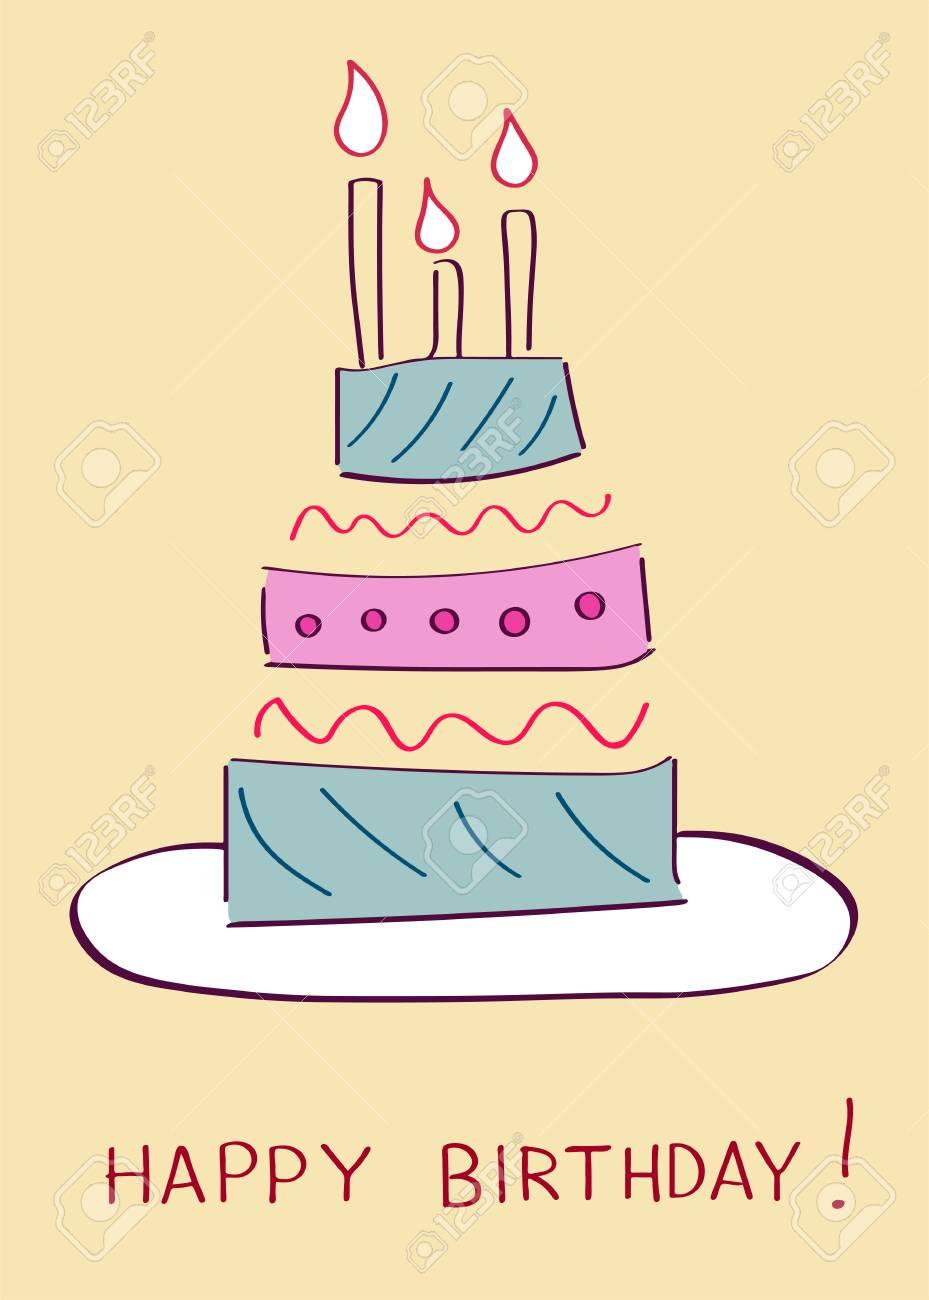 Pleasant Birthday Cake On Greeting Card Template Vector Illustration Funny Birthday Cards Online Inifodamsfinfo